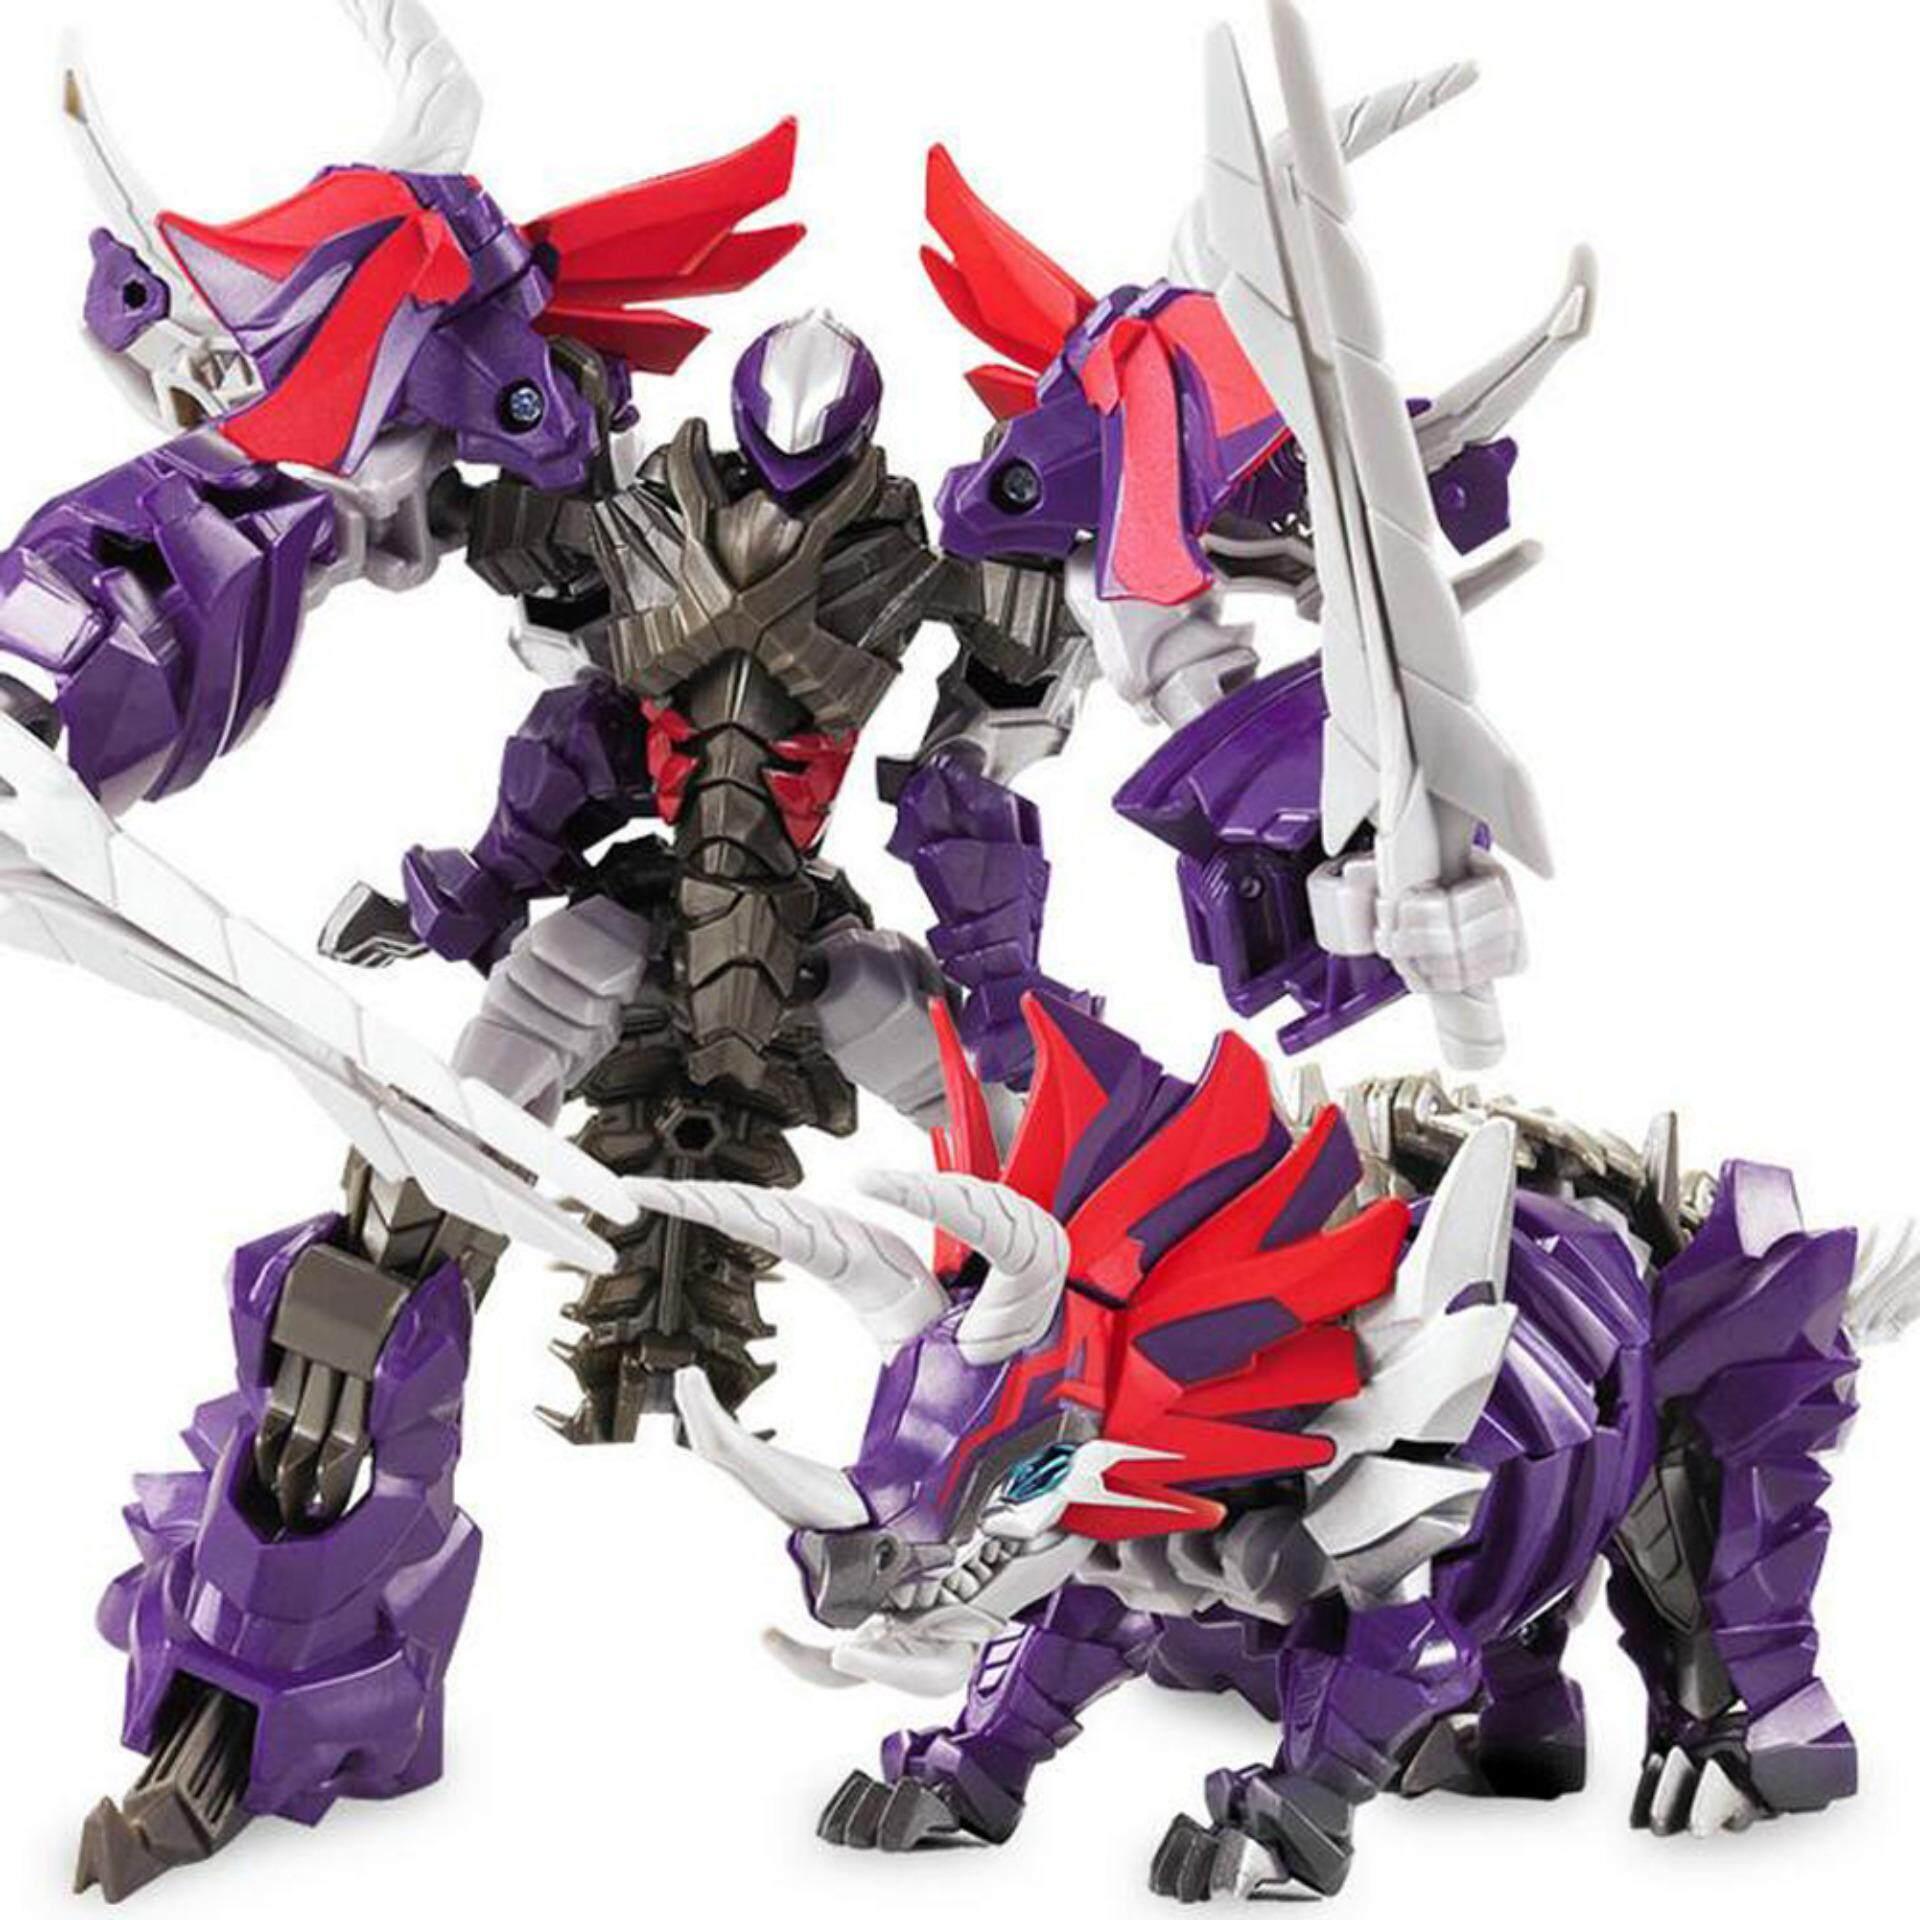 Transformers 4 Action Figure Autobots Slag Model Triceratops - intl